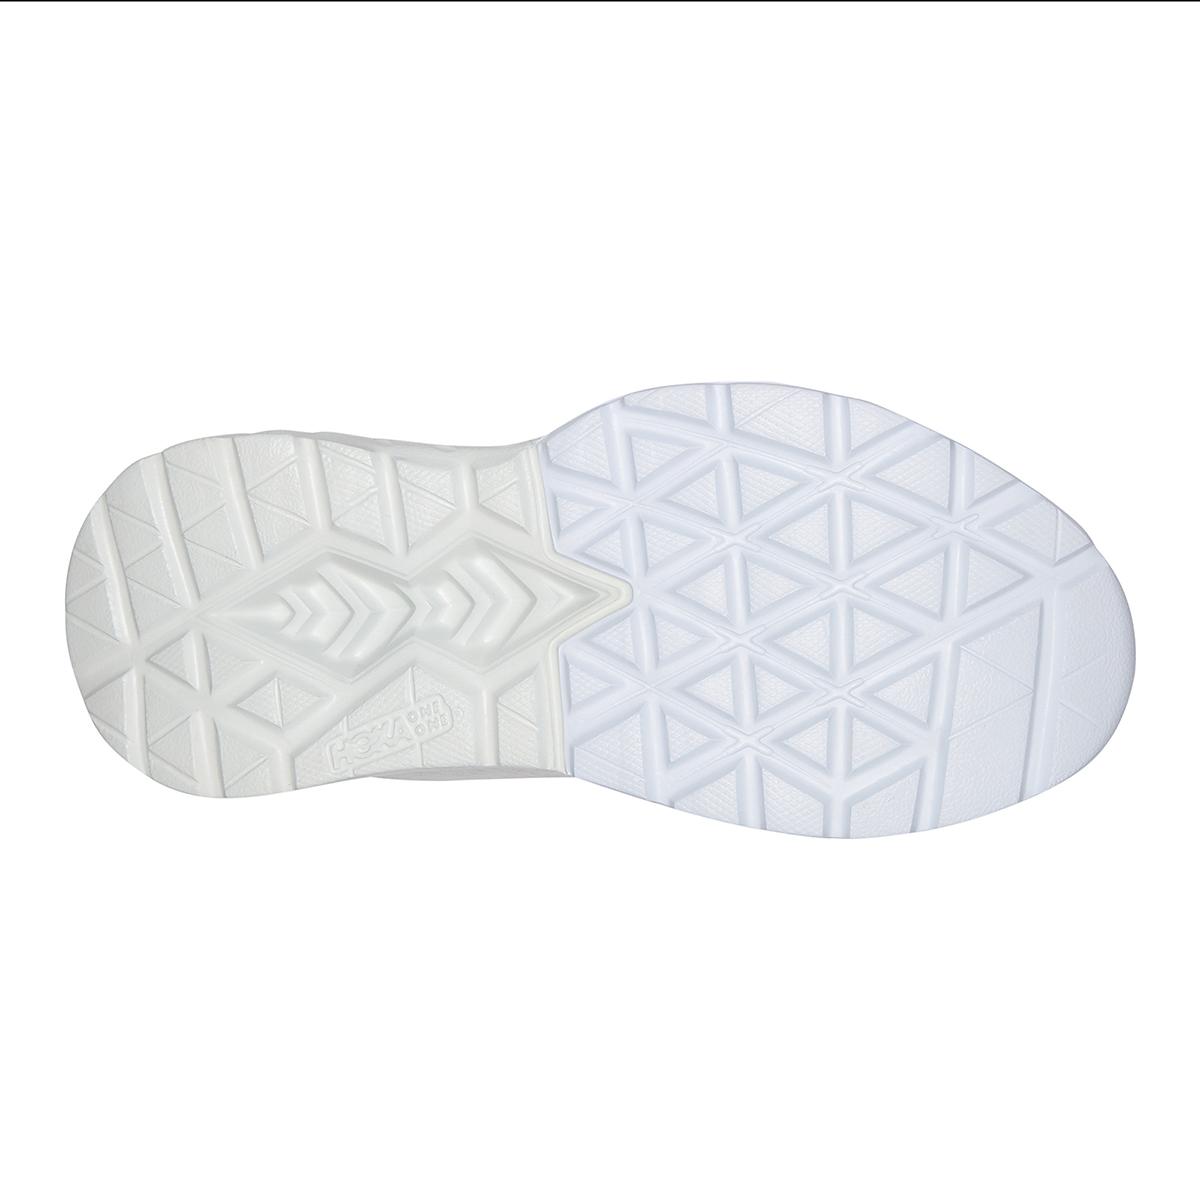 Women's Hoka One One Mach 3 Running Shoe - Color: White (Regular Width) - Size: 5, White, large, image 6